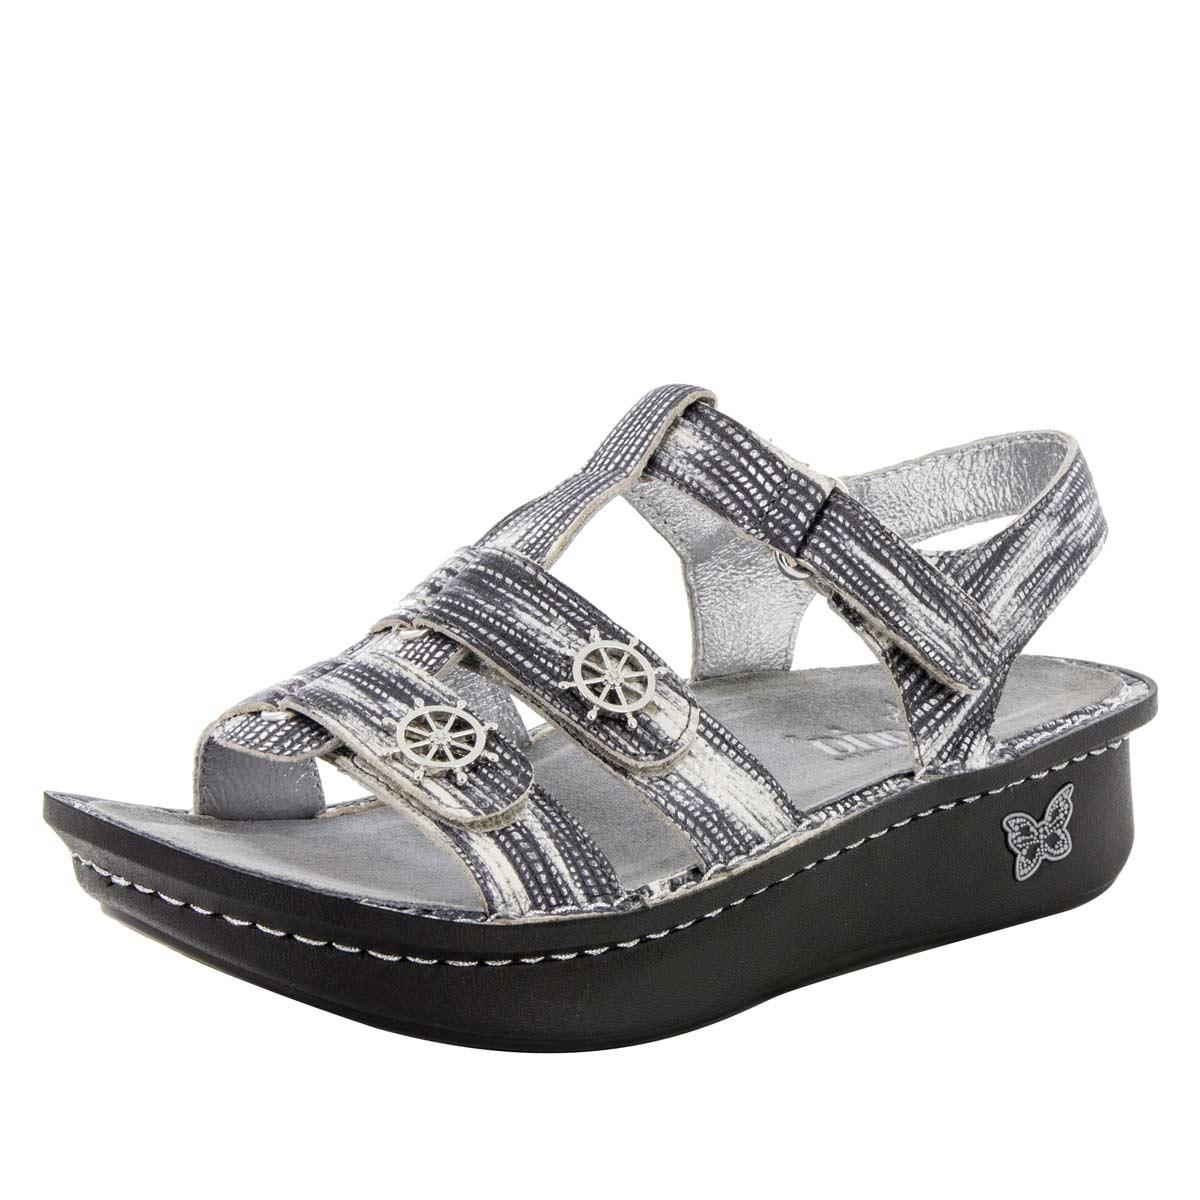 4fce97f9546 Kleo Wrapture Sandal - Alegria Shoes